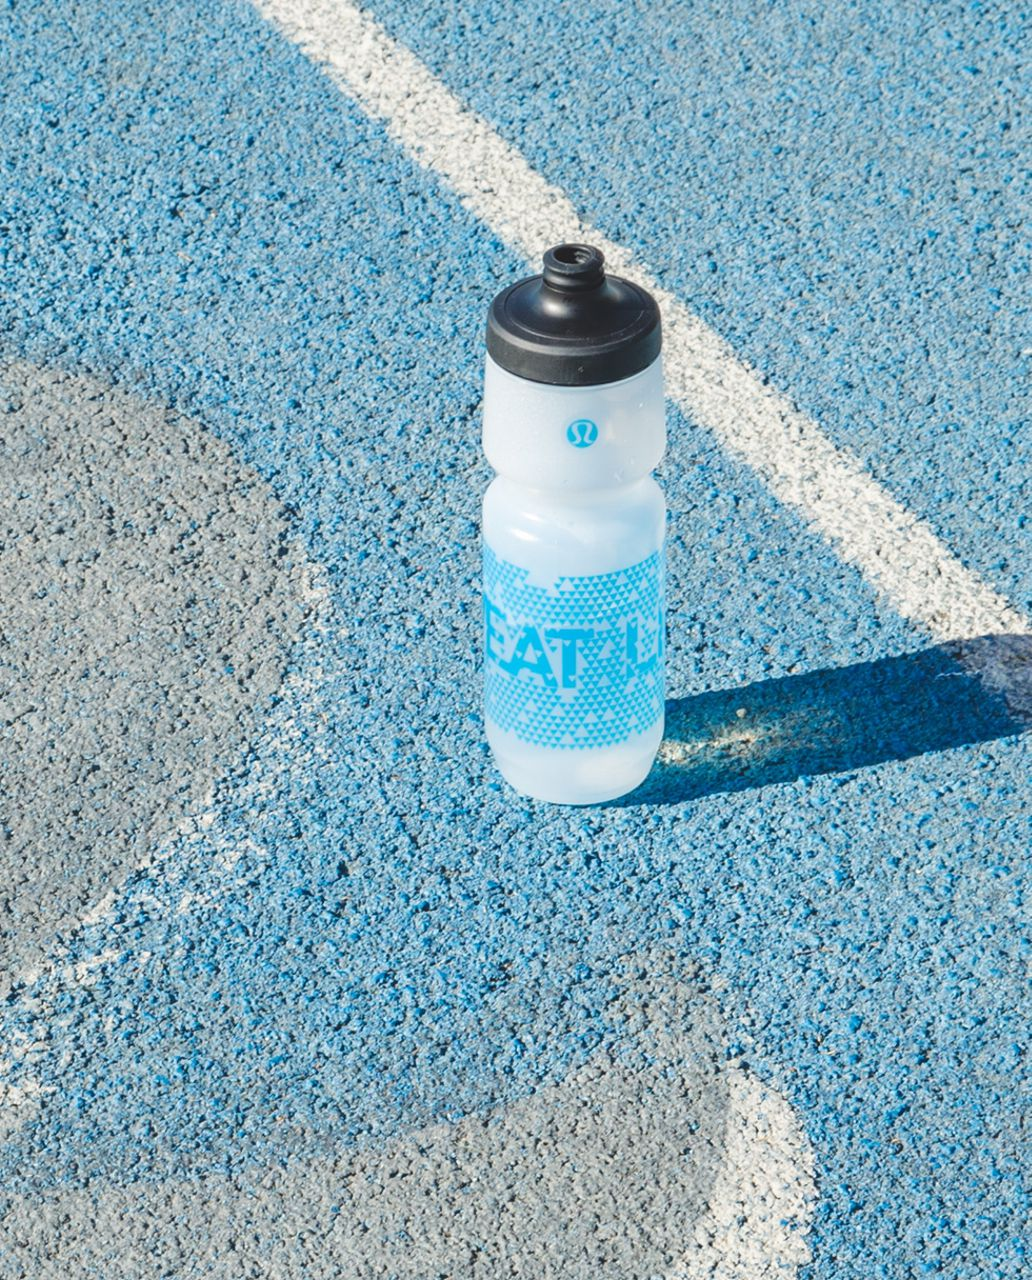 Lululemon Purist Cycling Water Bottle - Sweat Life Kayak Blue Deep Navy